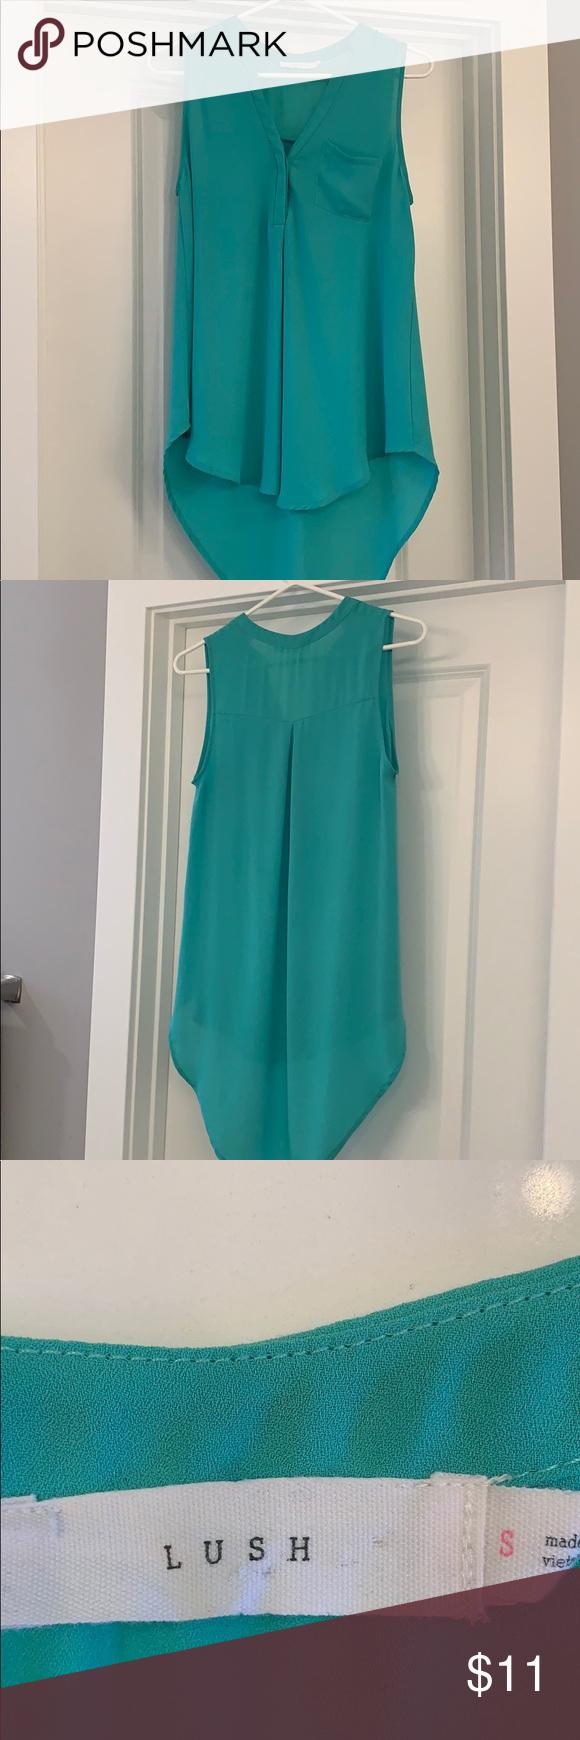 Lush Green Mint Teal Hi Low Tank Euc Size S In 2020 Clothes Design Fashion Lush Green